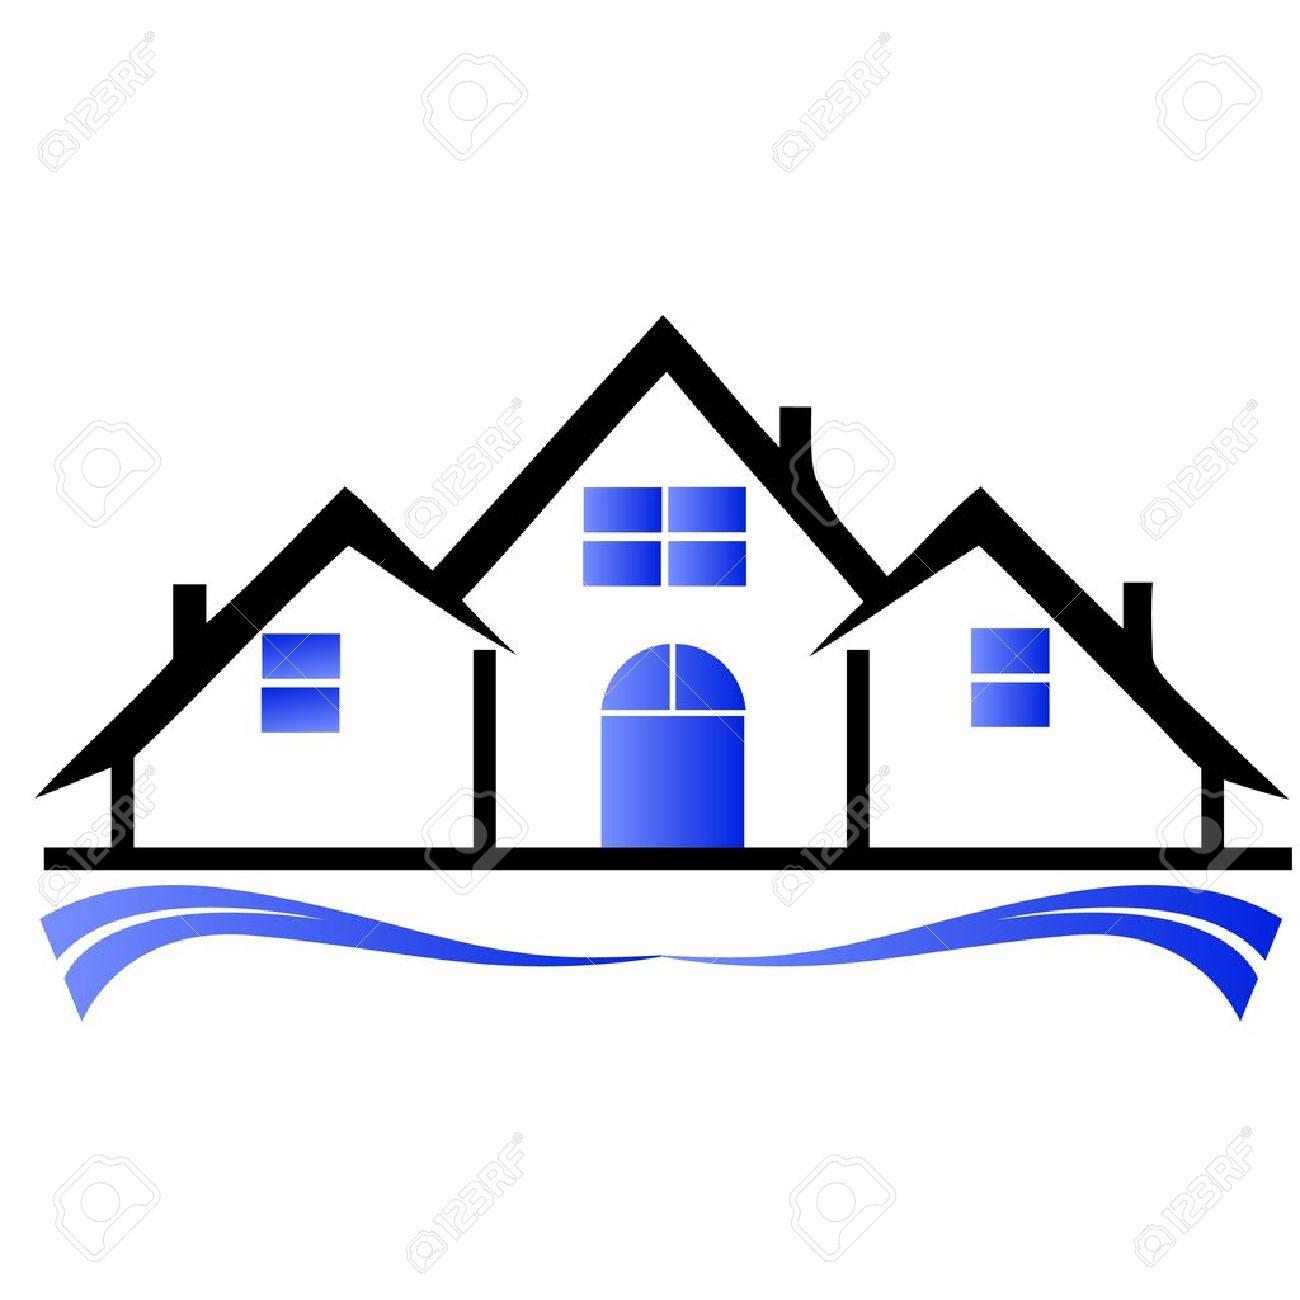 Houses real estate logo.